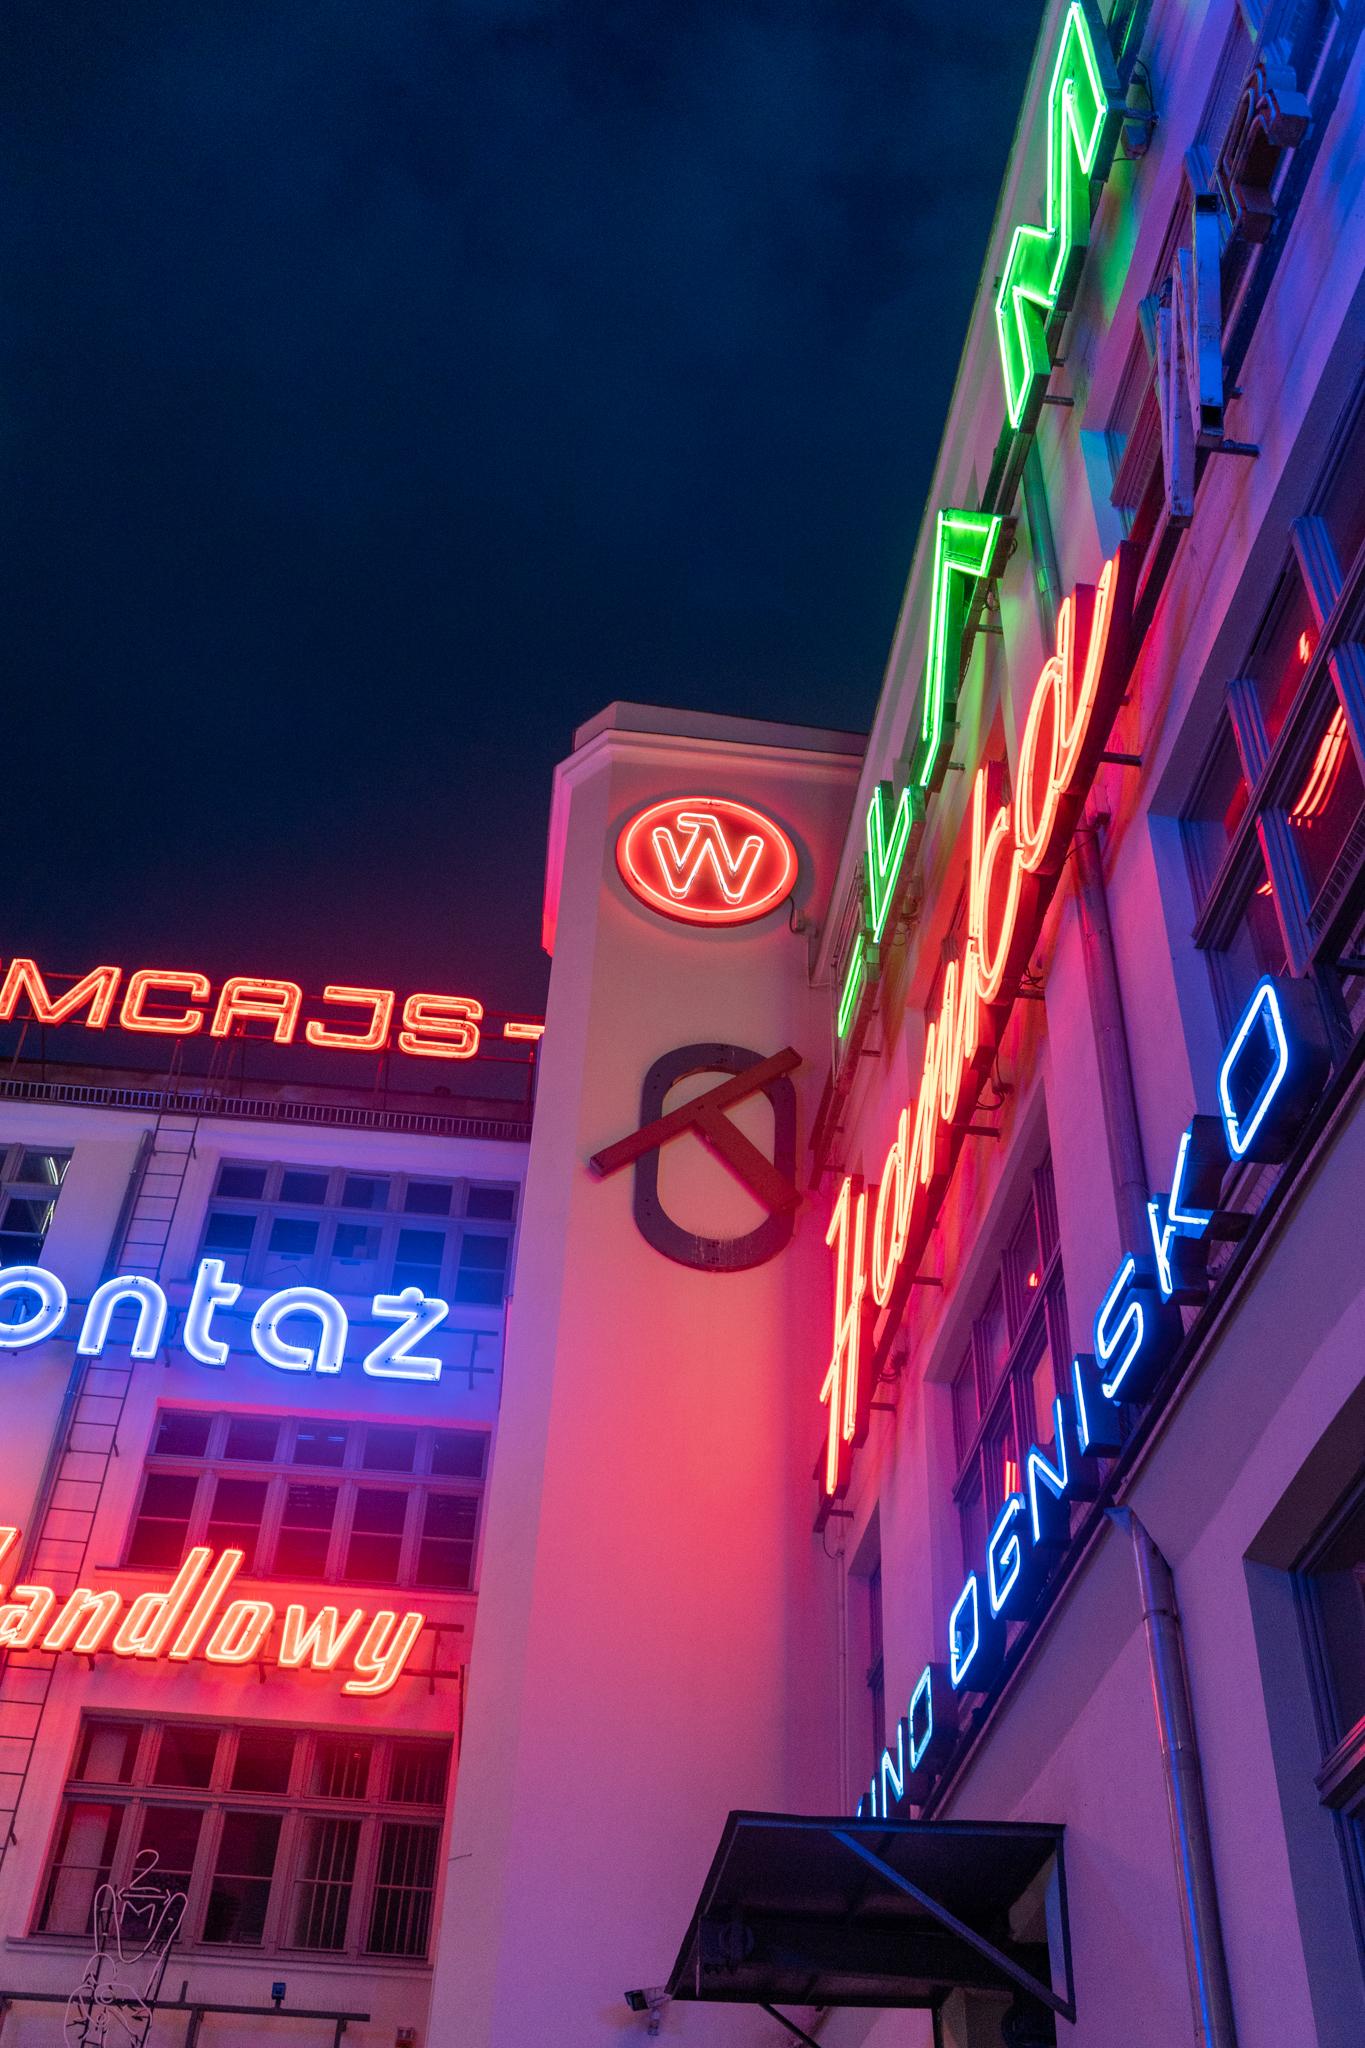 Neonschilder in Breslau